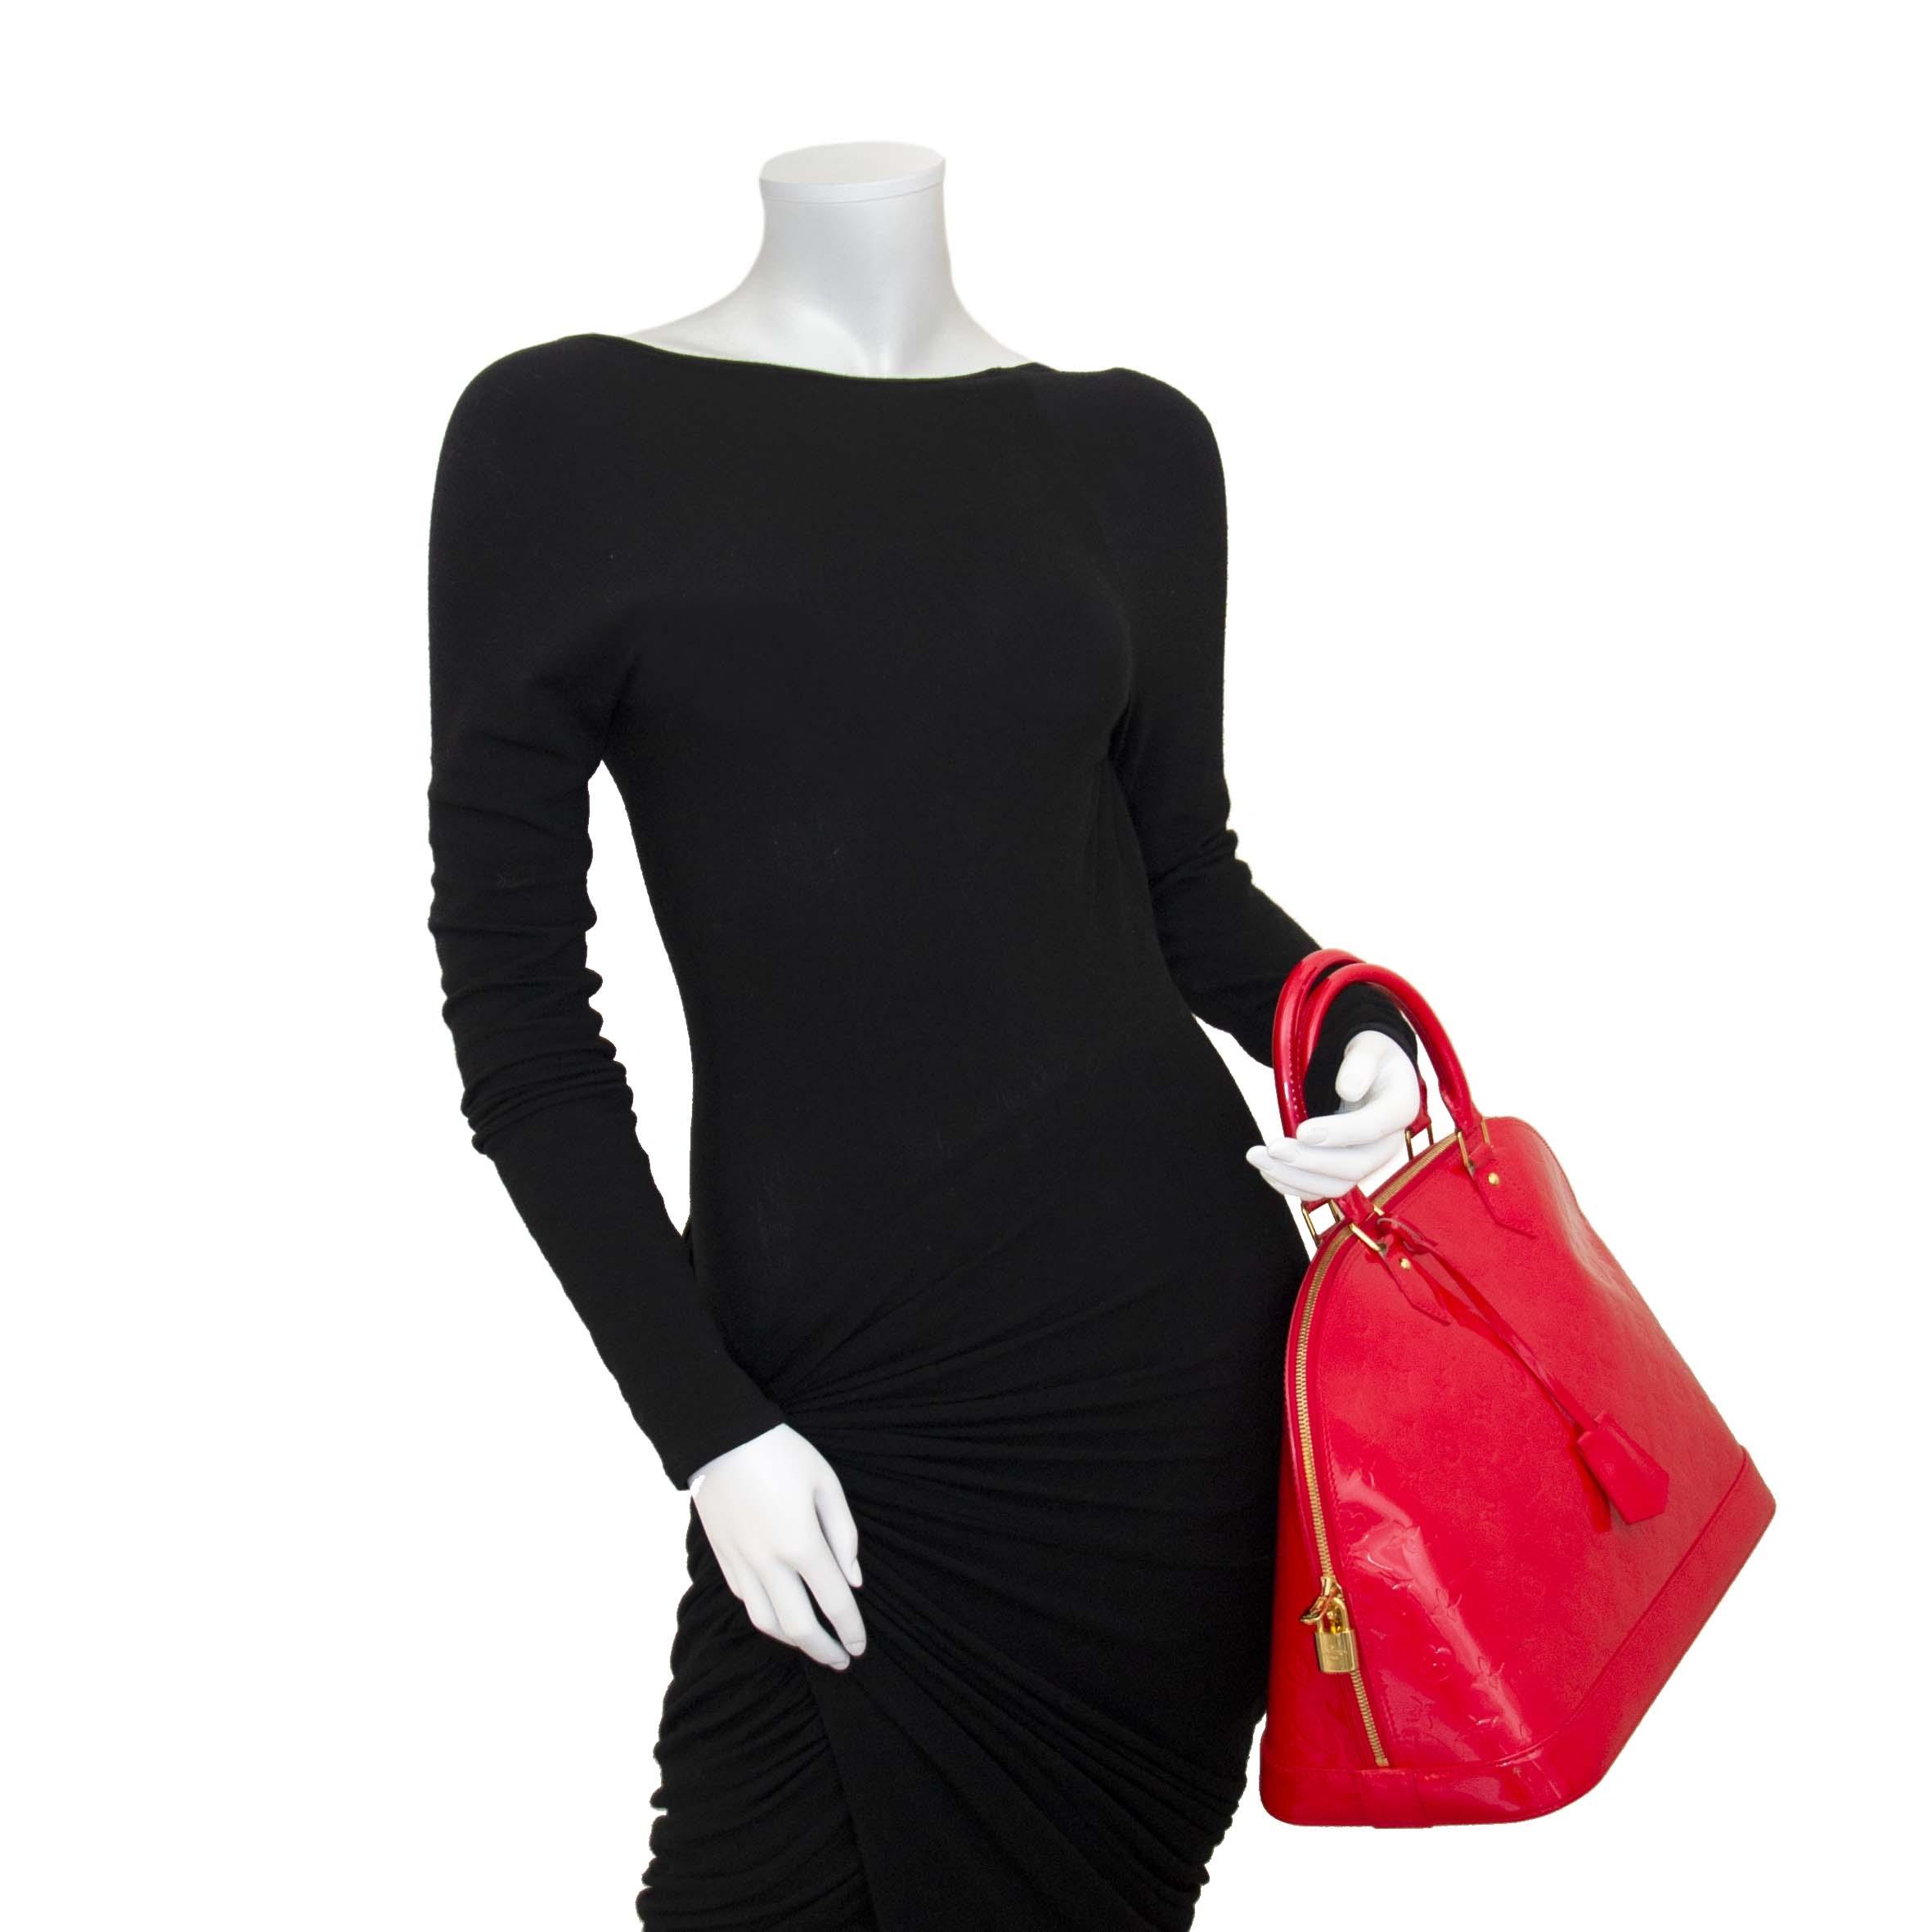 acheter en ligne seconde main Louis Vuitton Alma Vernis MM in Grenadine